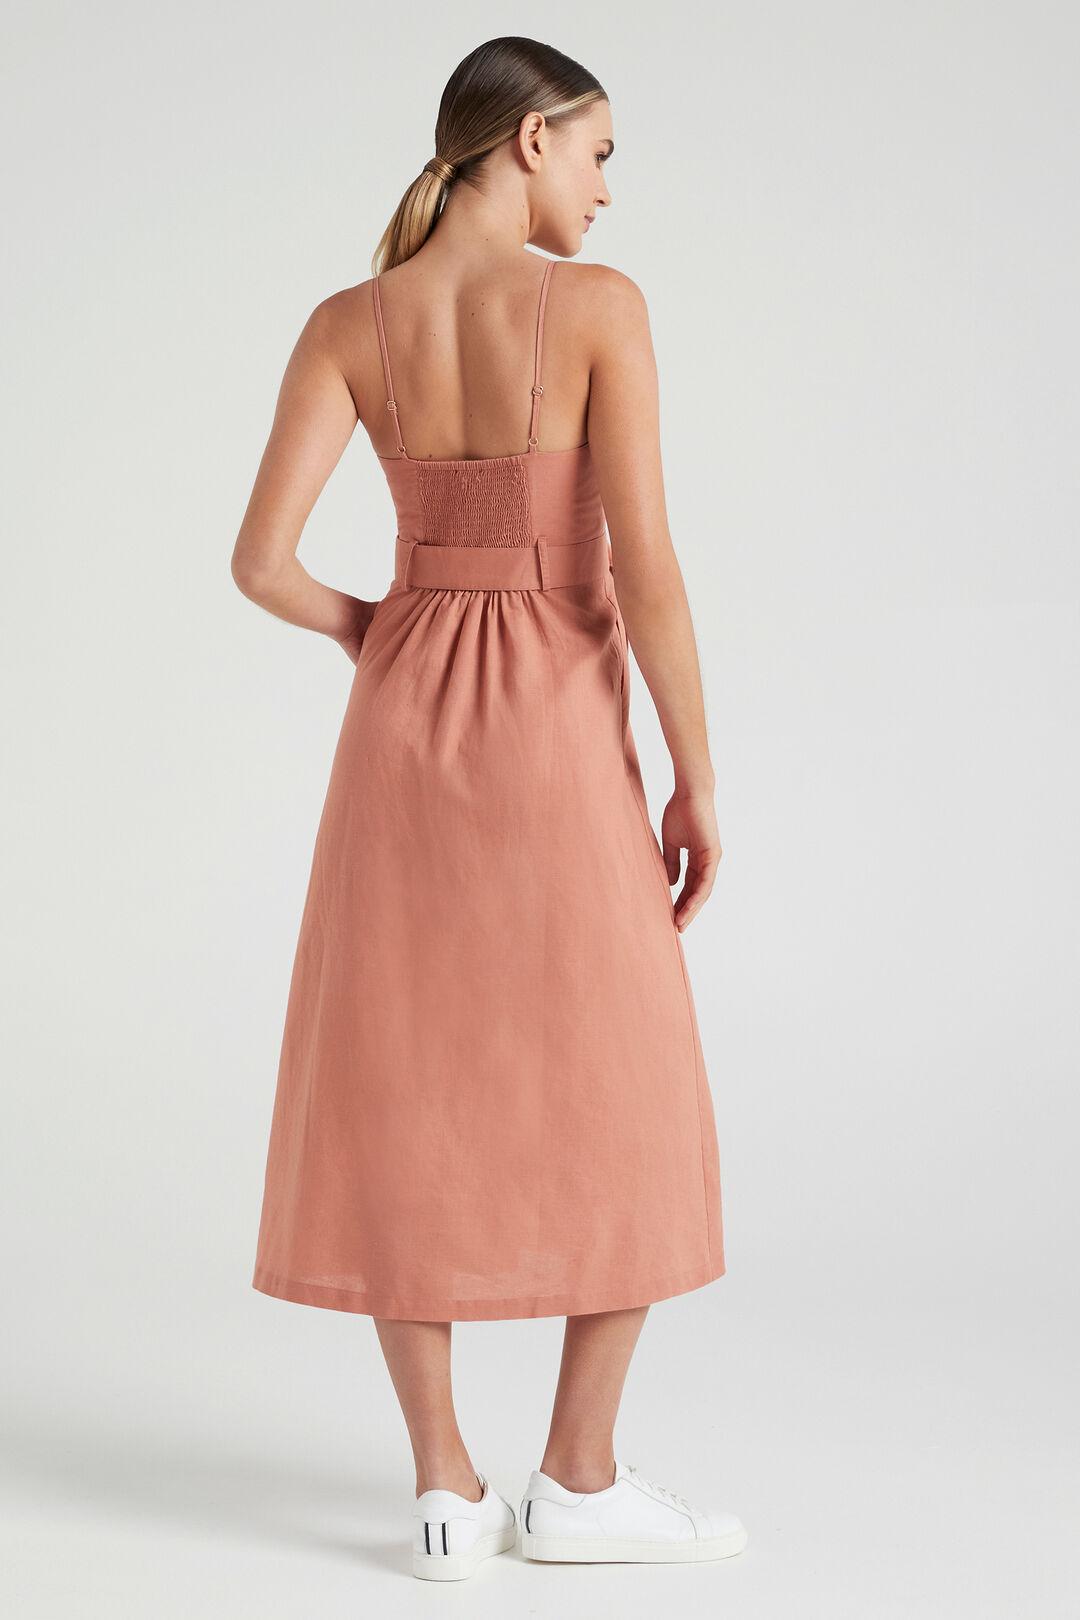 LINEN BUSTIER DRESS  FADED CLAY  hi-res